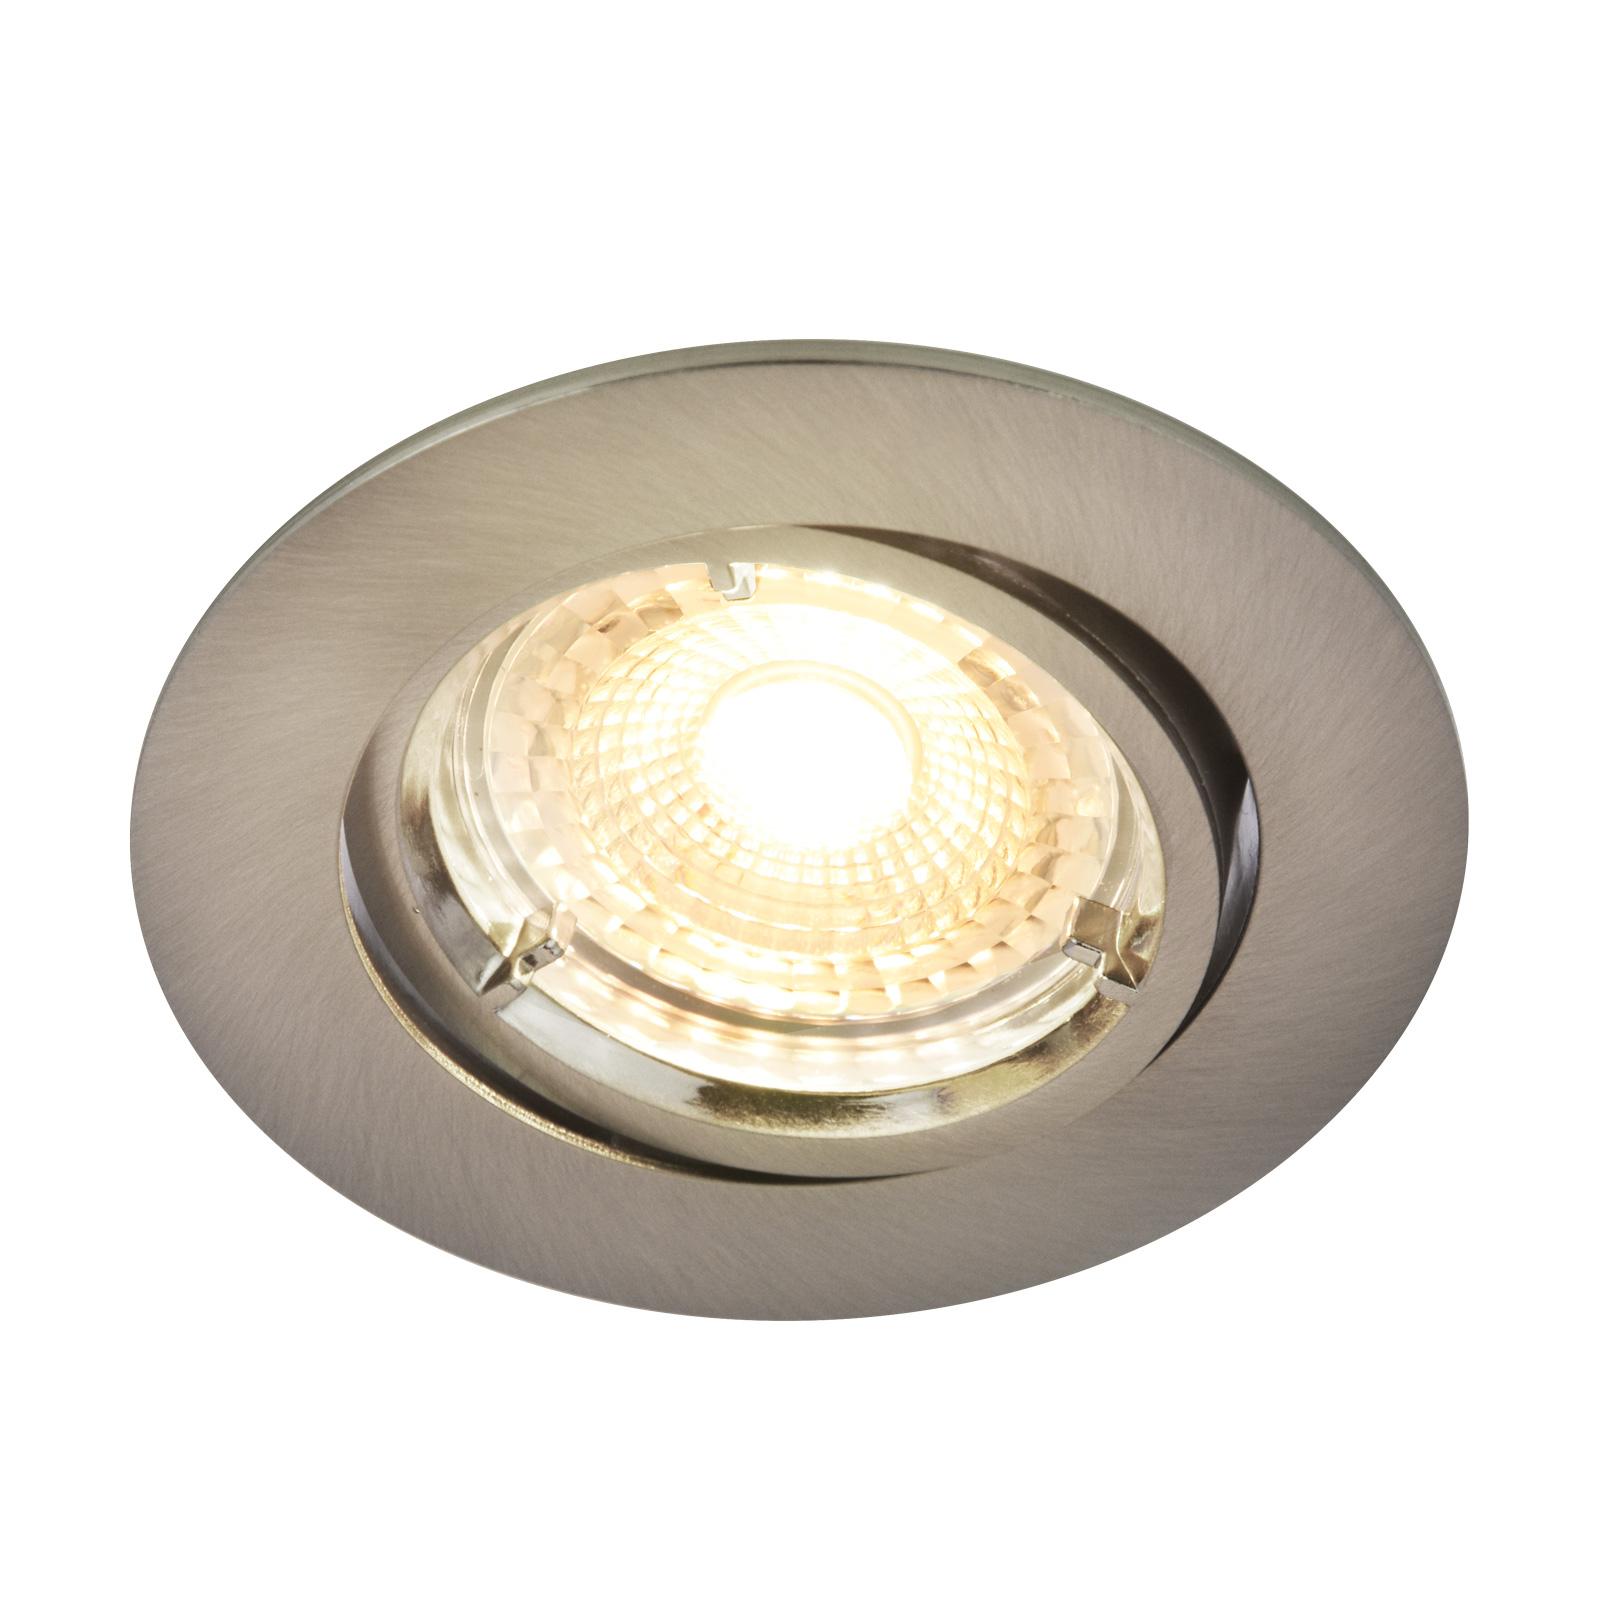 Carina-LED-kohdevalo, 2700K, dim tilt, nikkeli